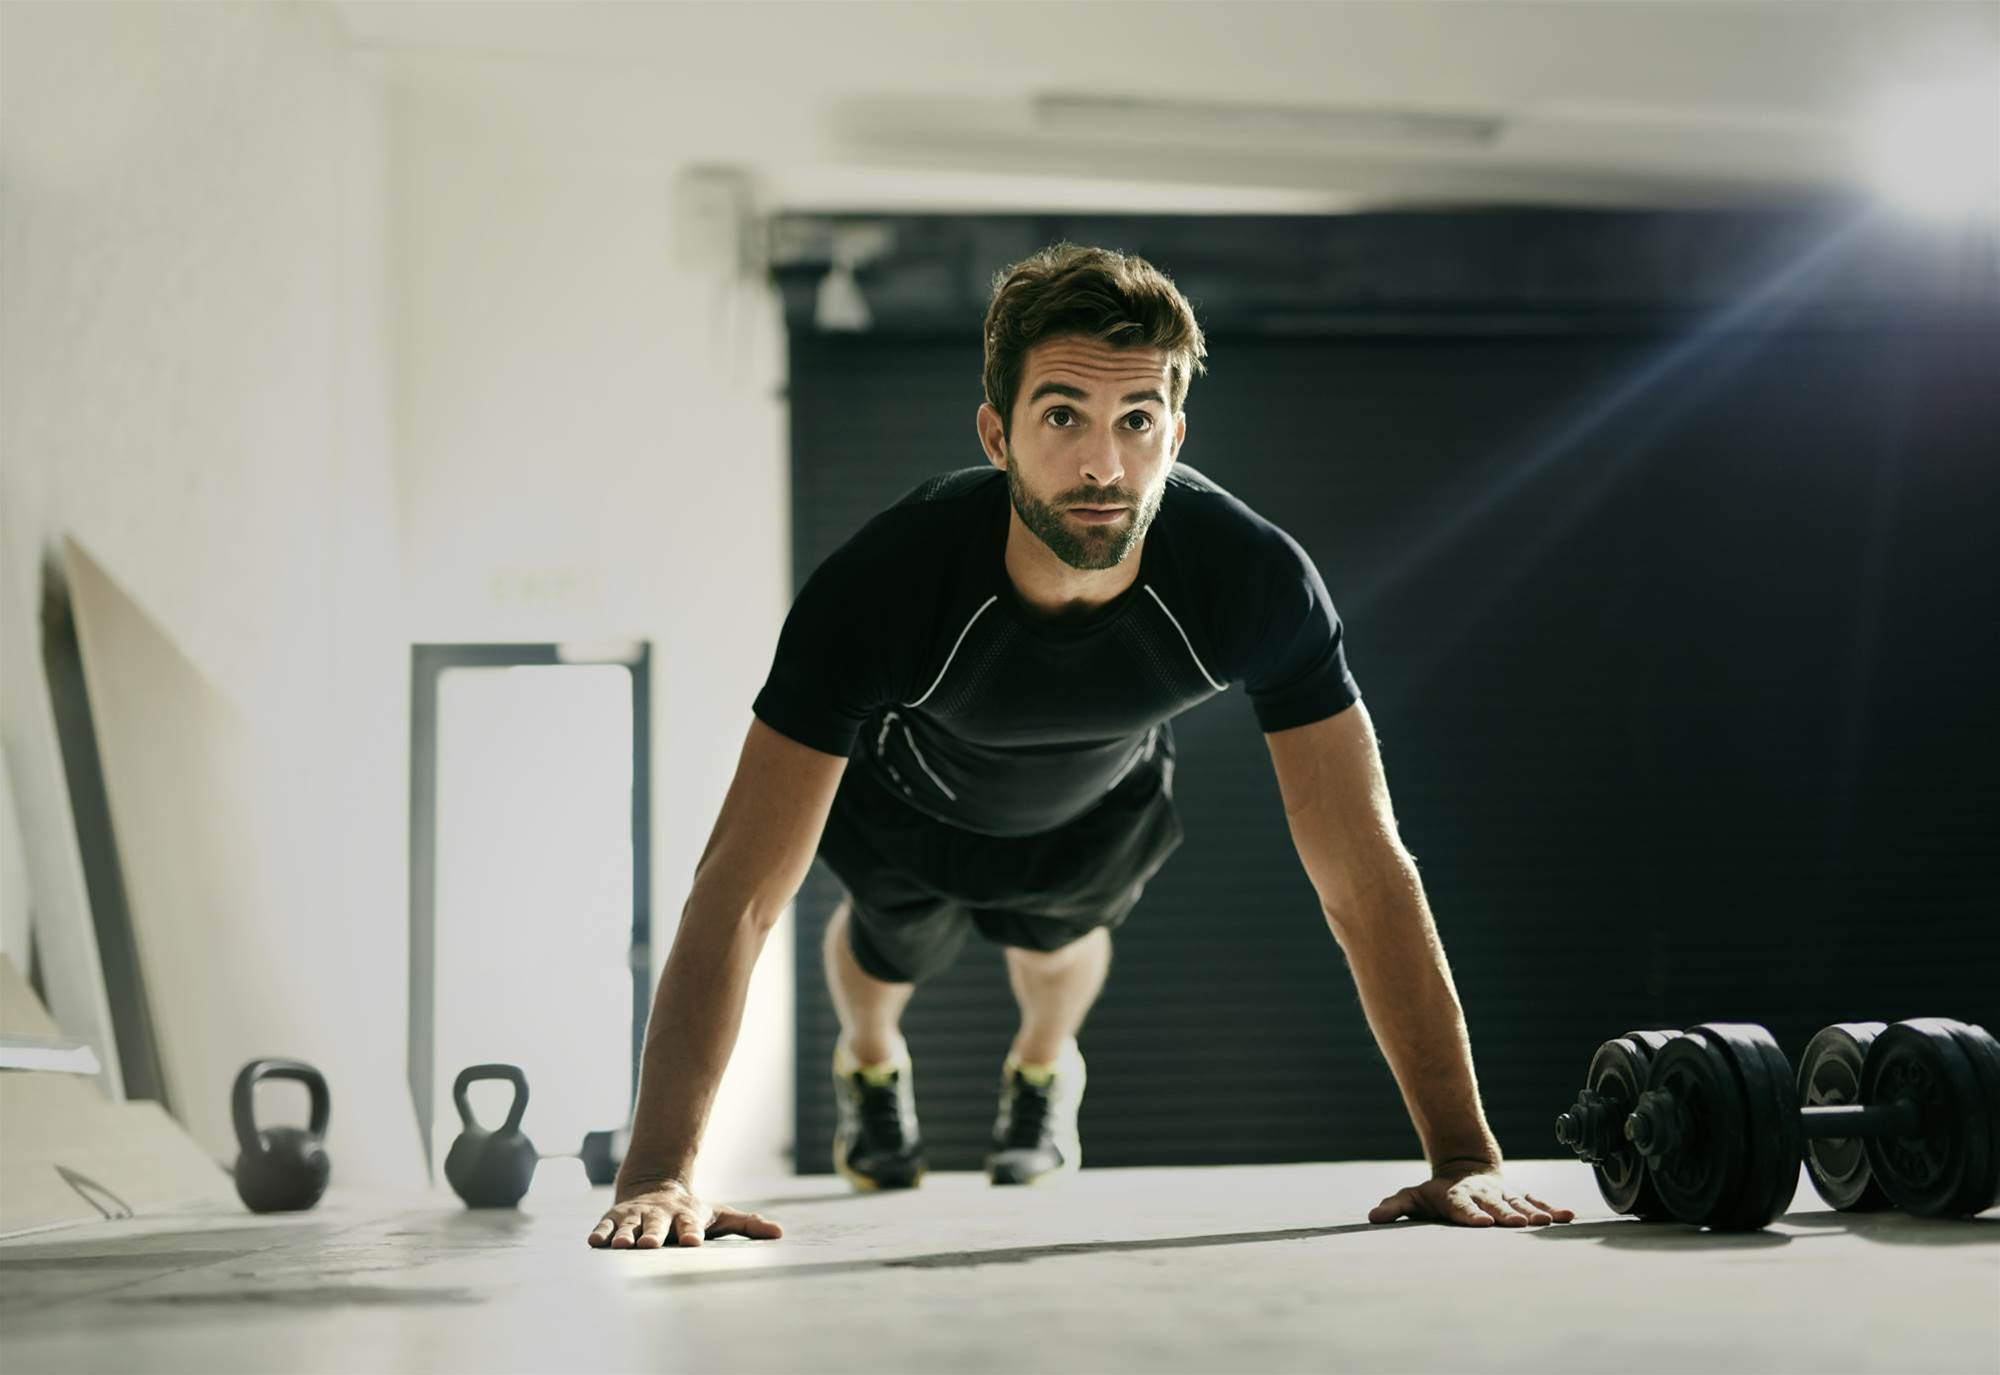 Your year-round strength training routine